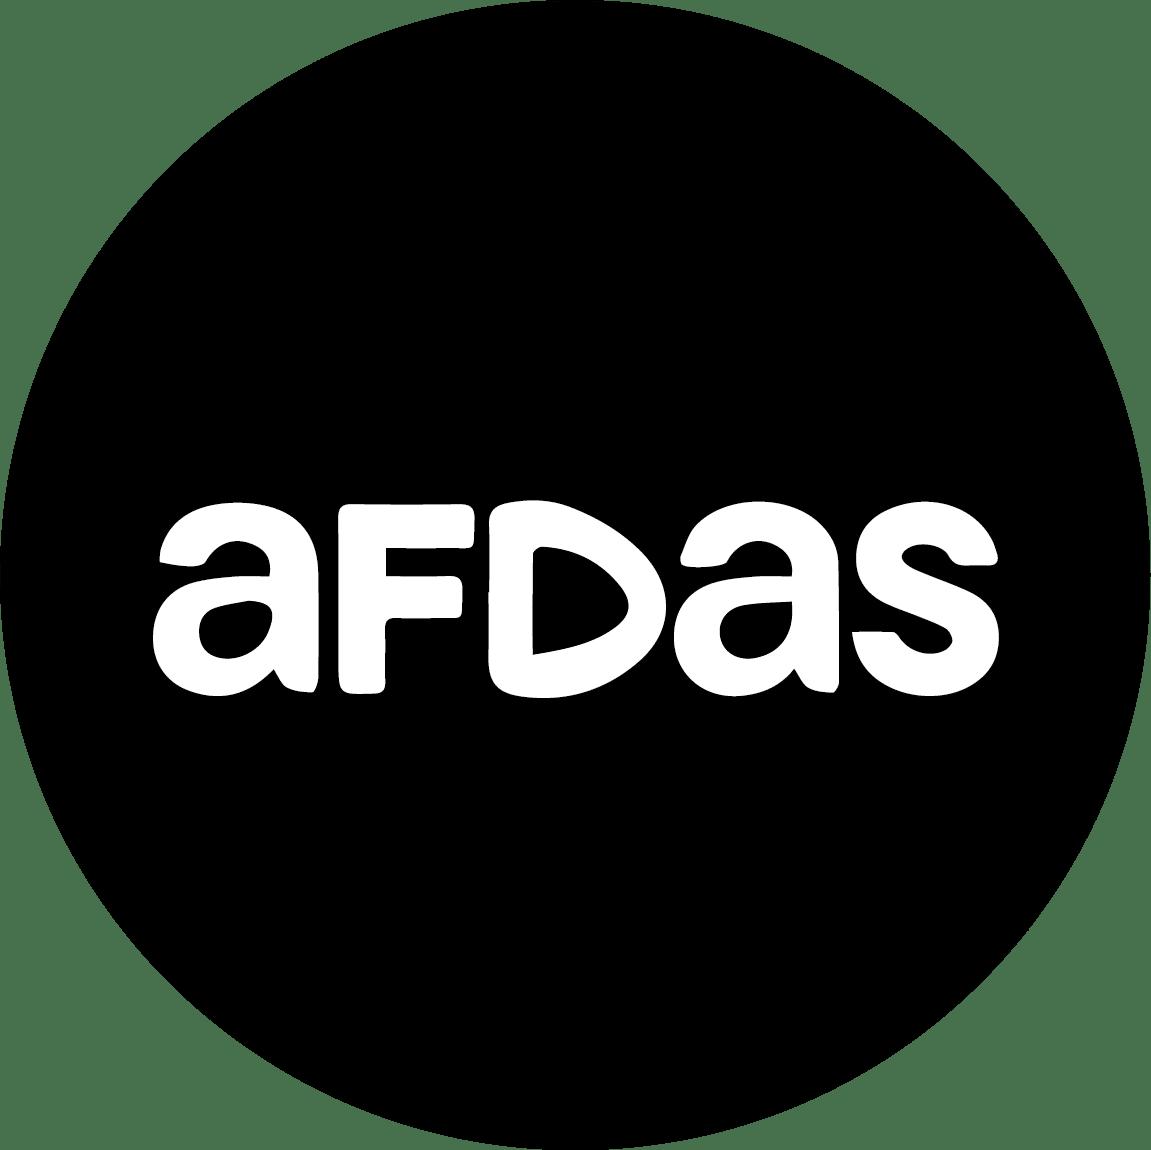 http://www.audiosculture.fr/wp-content/uploads/2021/05/AFDAS.png